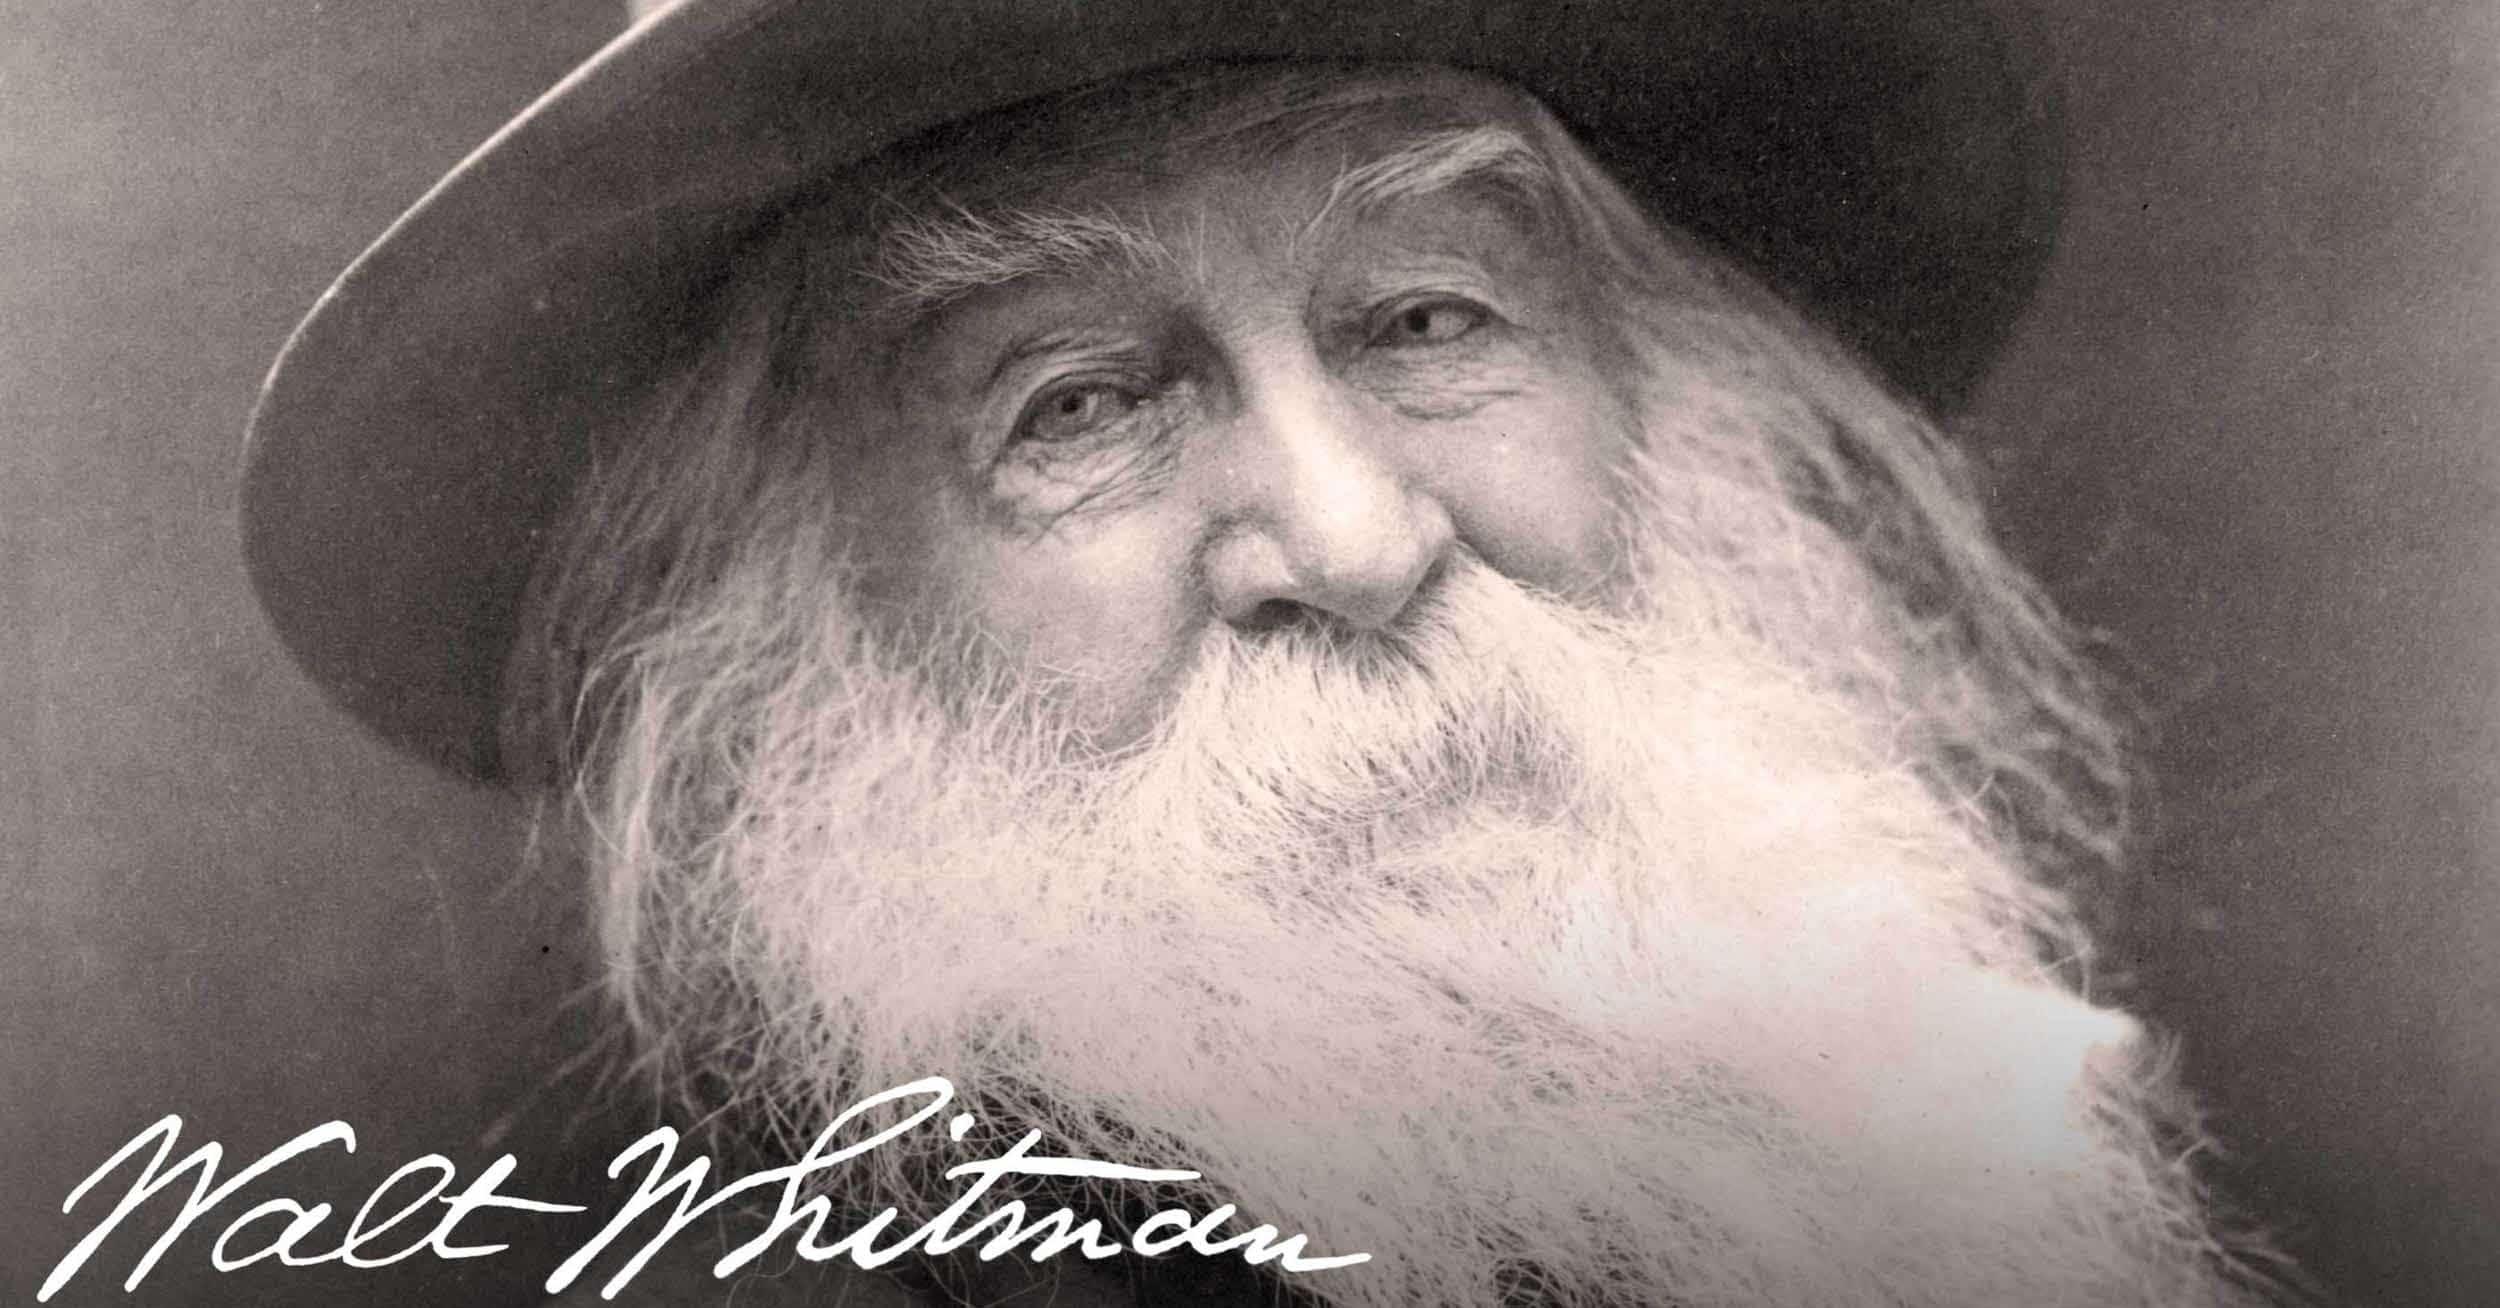 Walt Whitman Do I Contradict Myself?